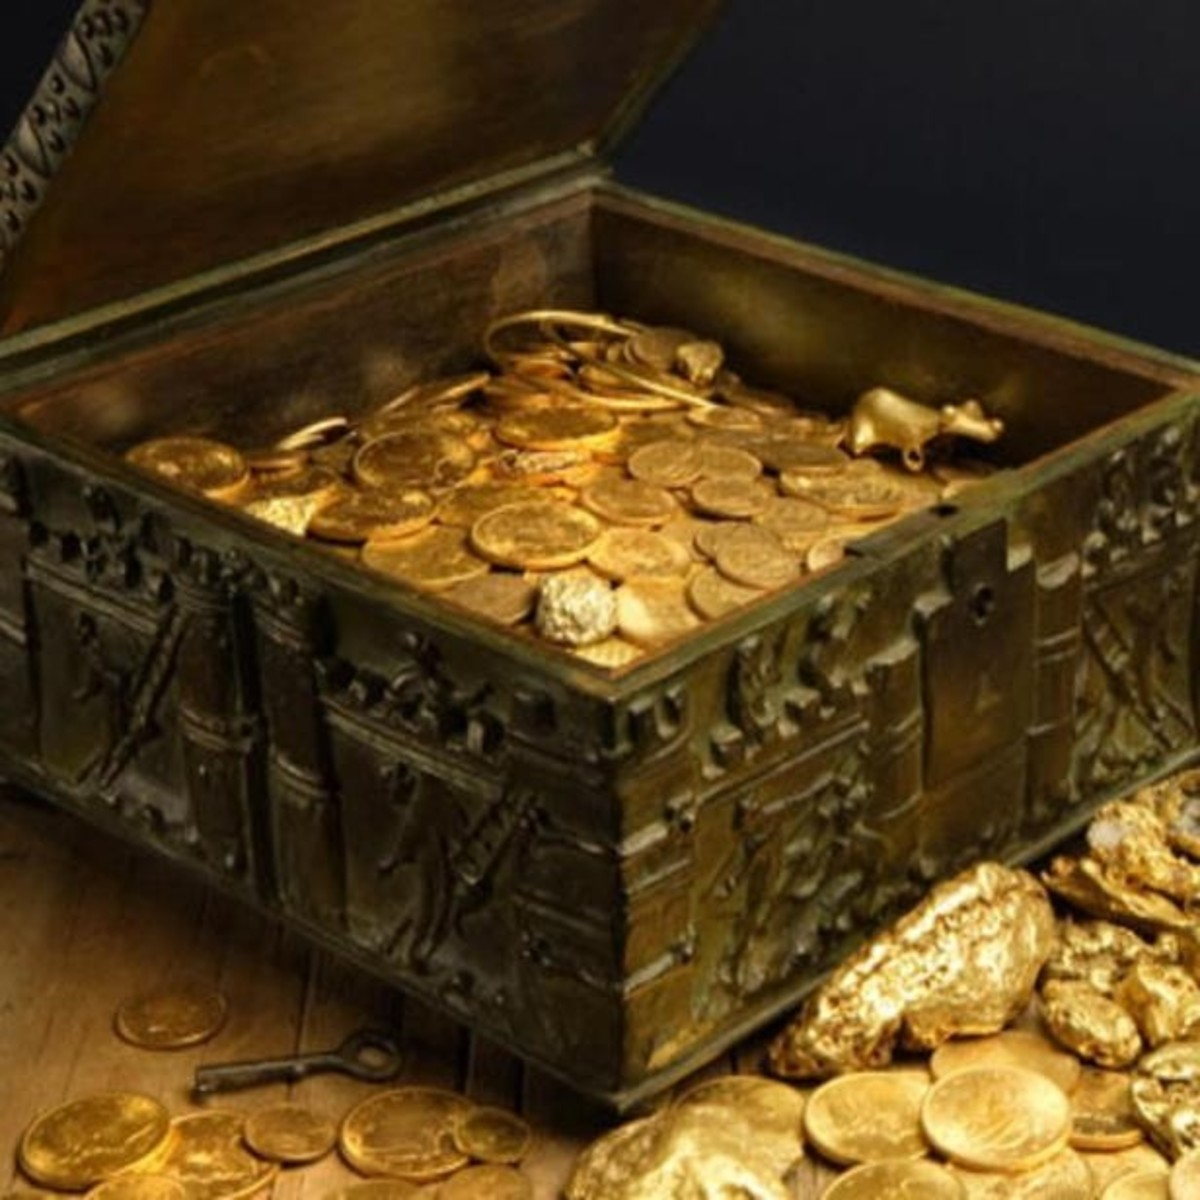 Photo of Forrest Fenn's Treasure Chest